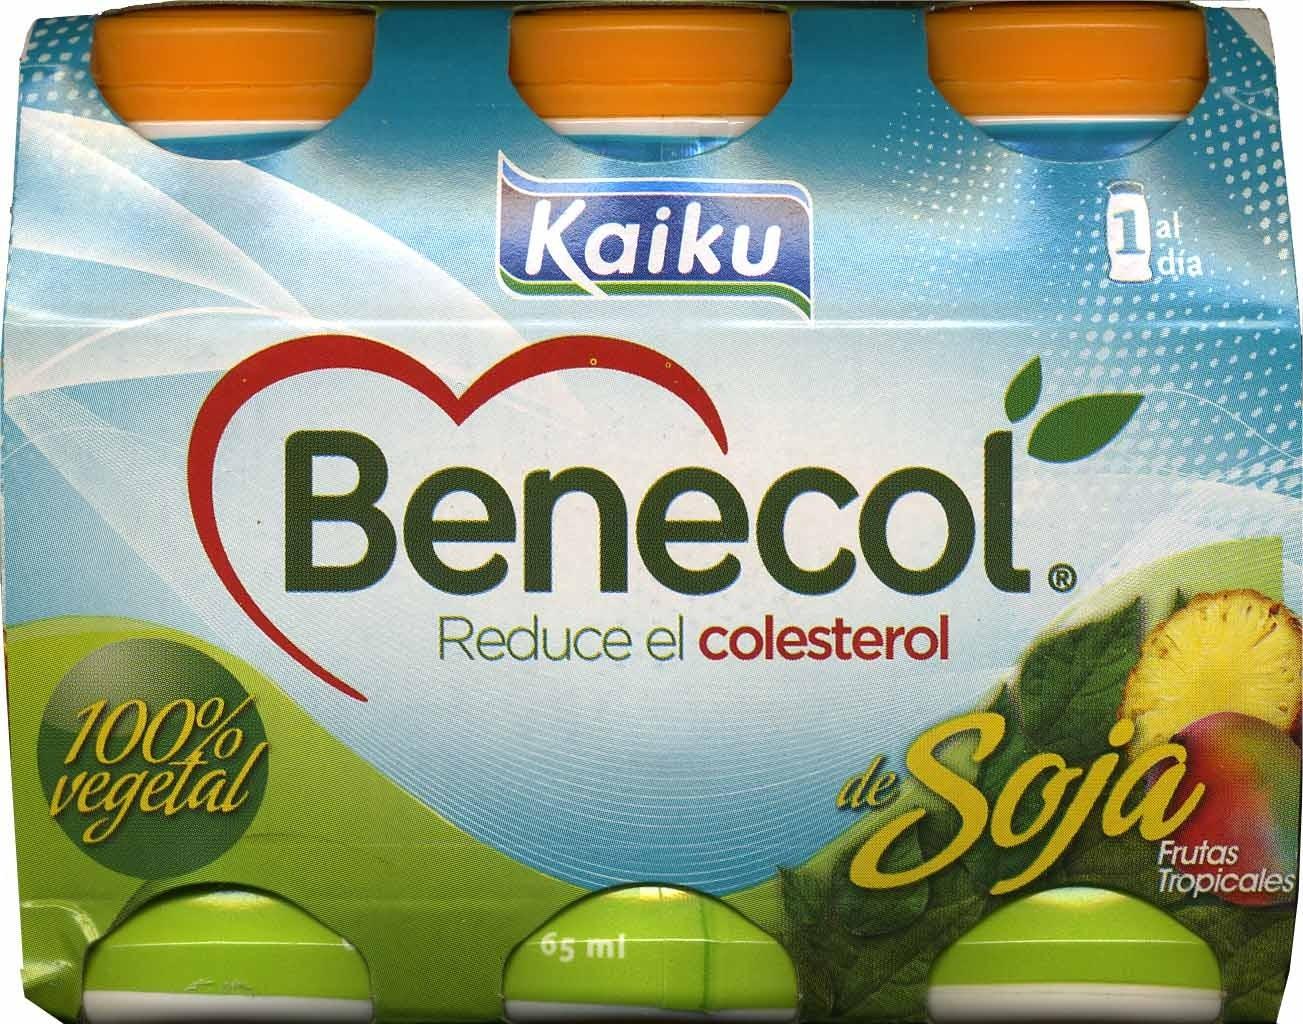 Benecol Soja - Producte